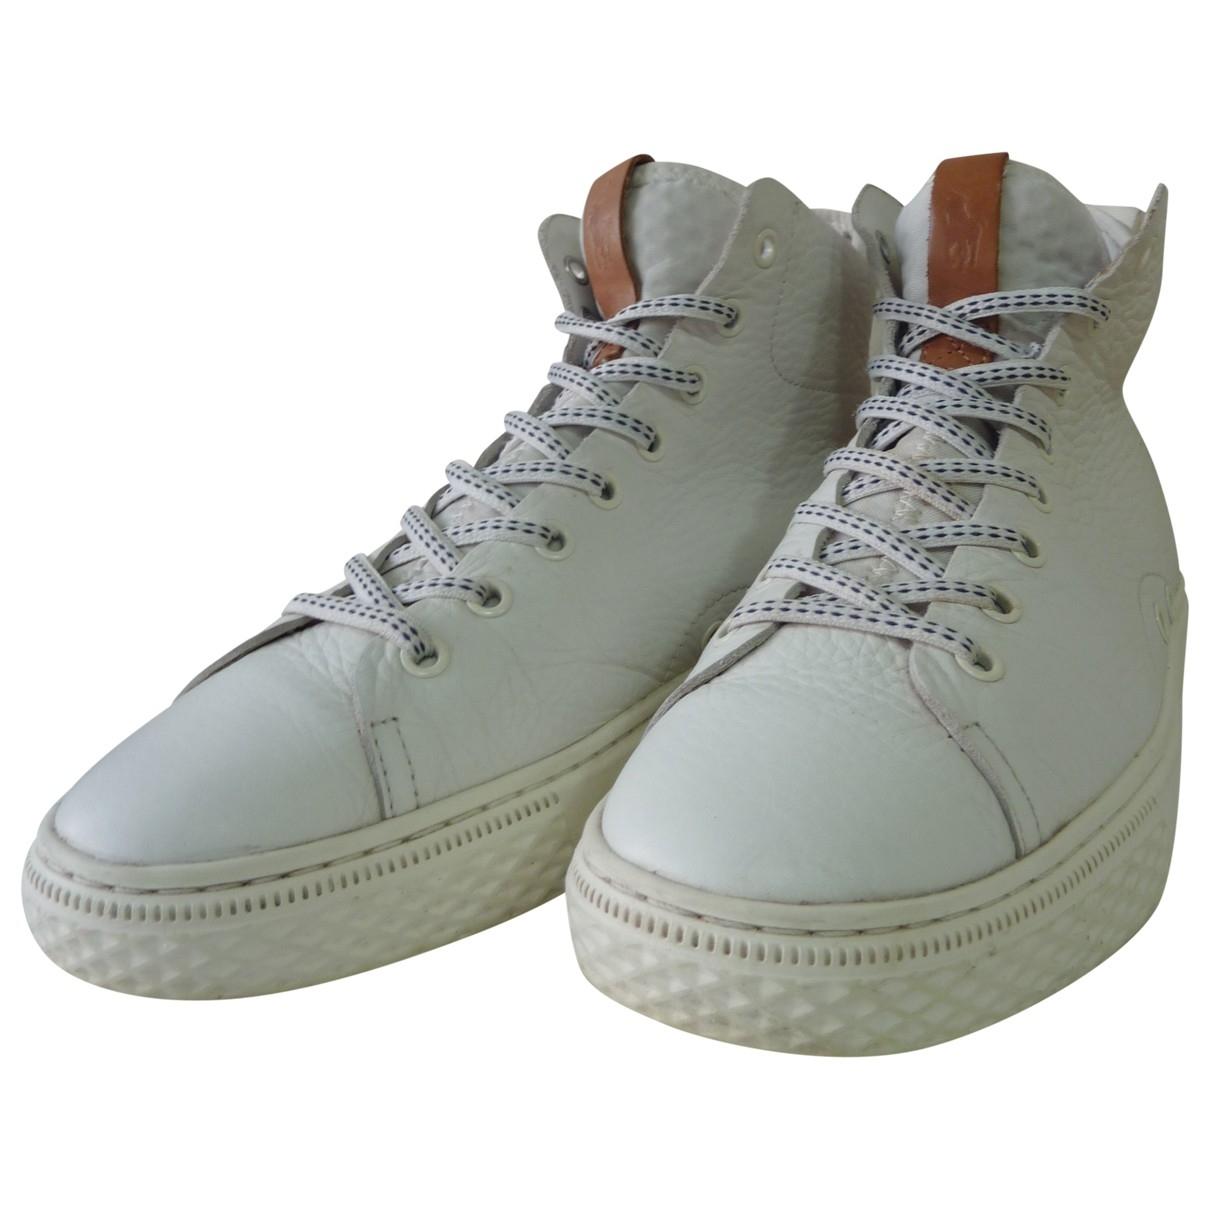 Polo Ralph Lauren \N Sneakers in  Weiss Leder